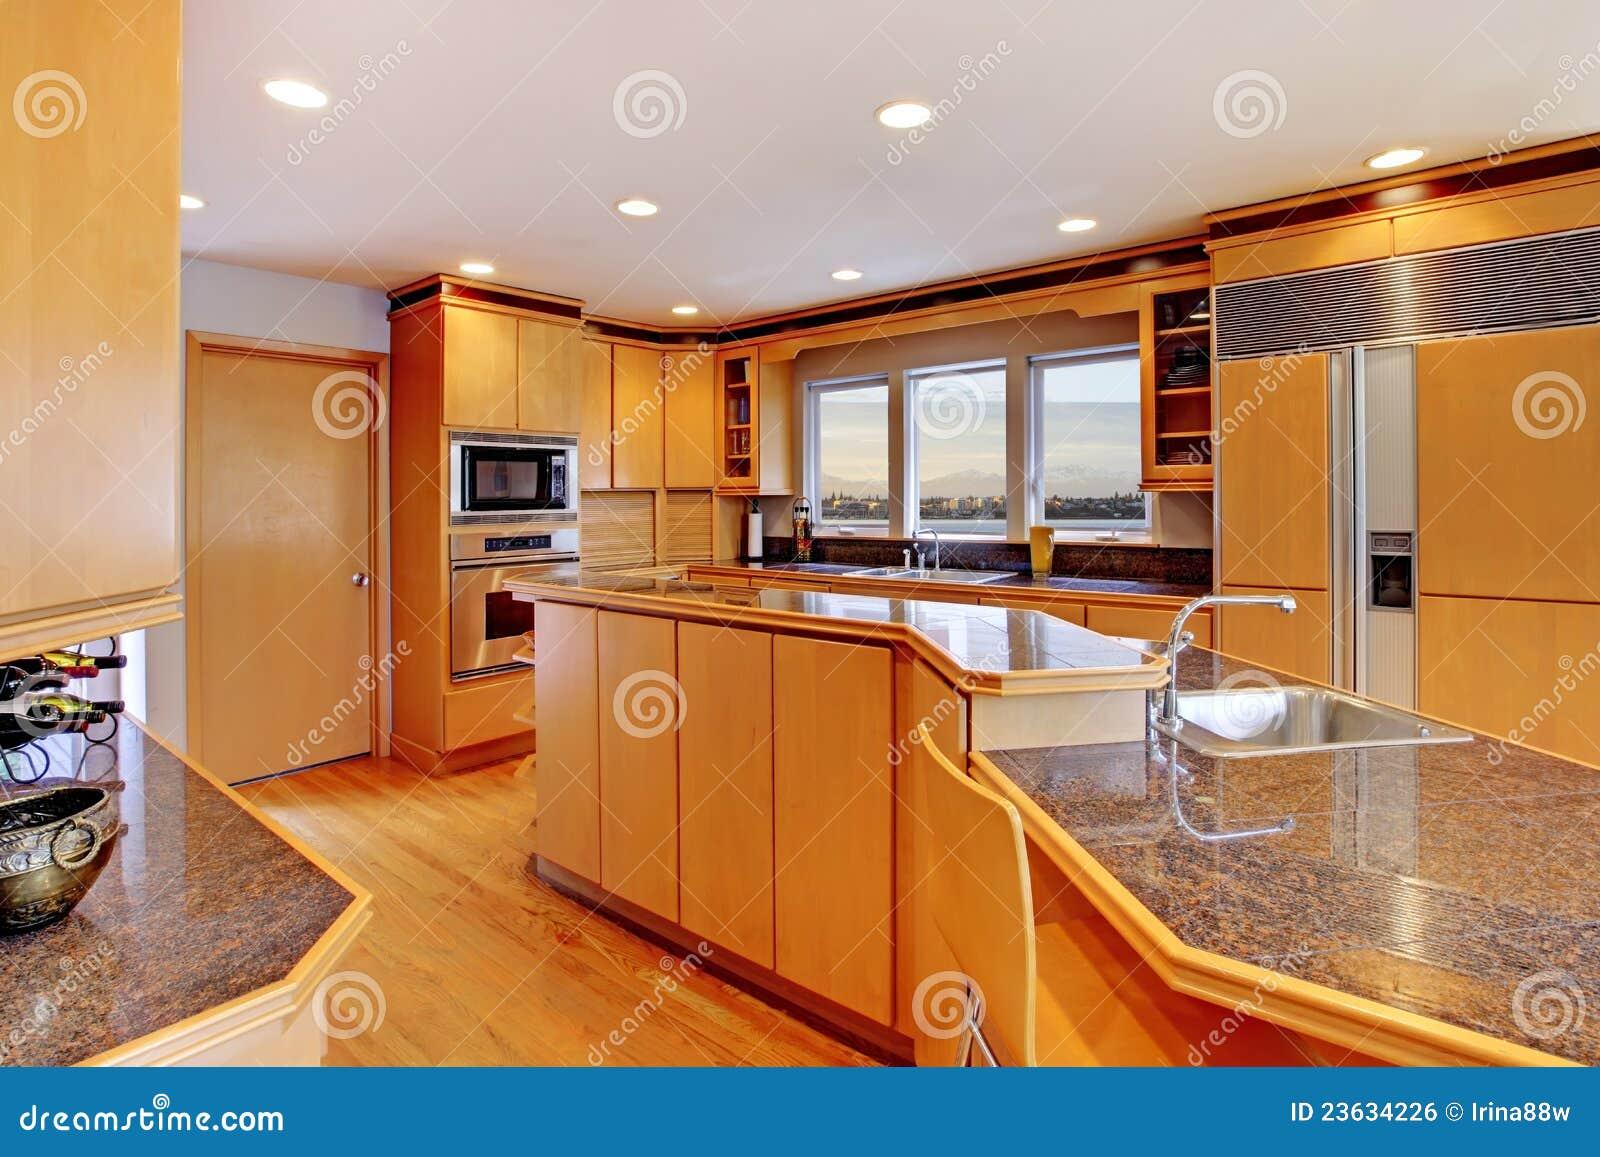 Cocina de madera moderna de lujo grande imagen de archivo - Cocina moderna madera ...